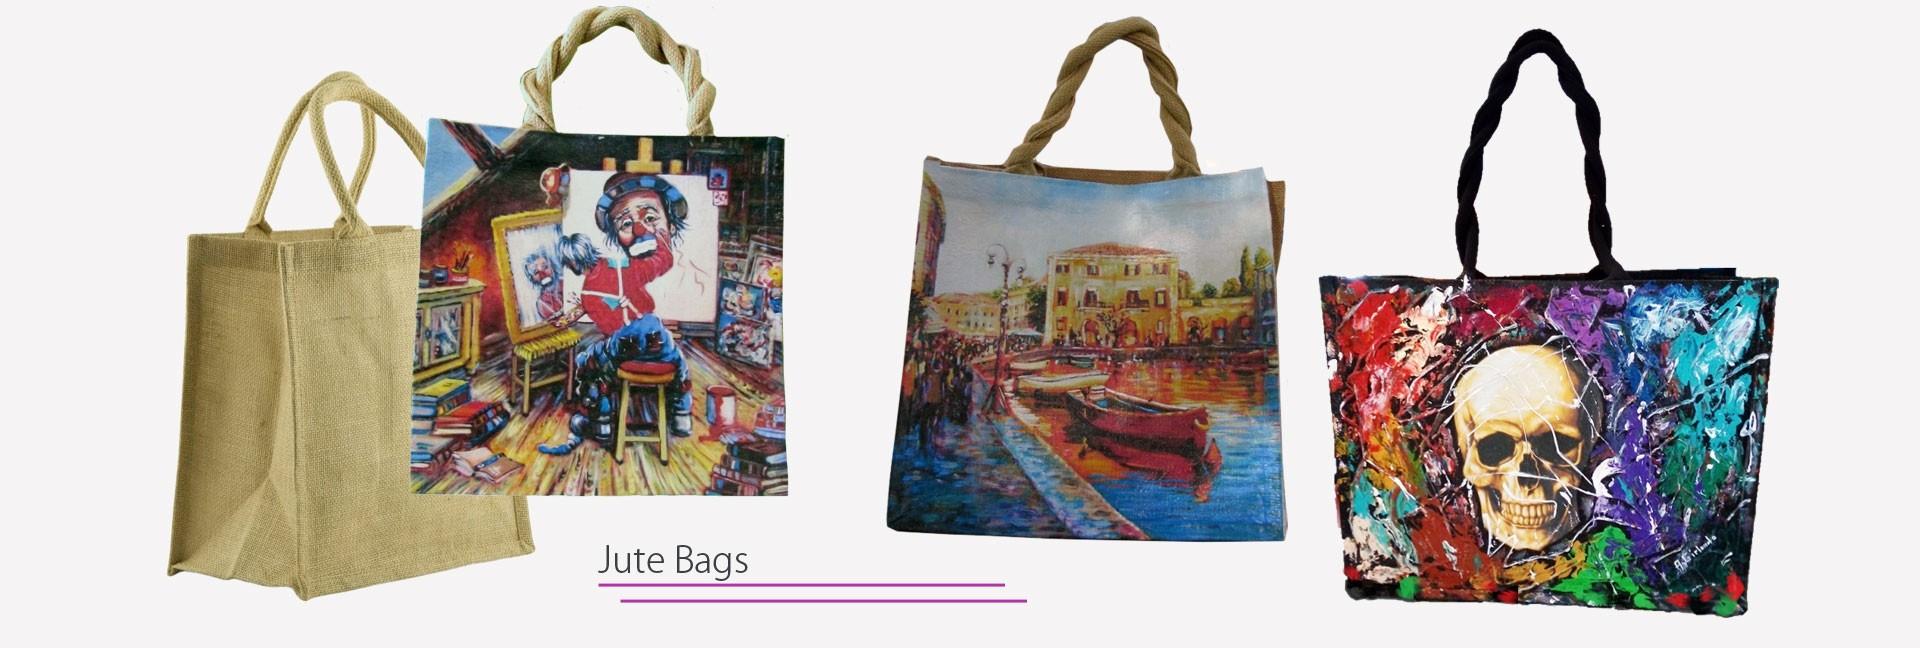 Jute women's bags